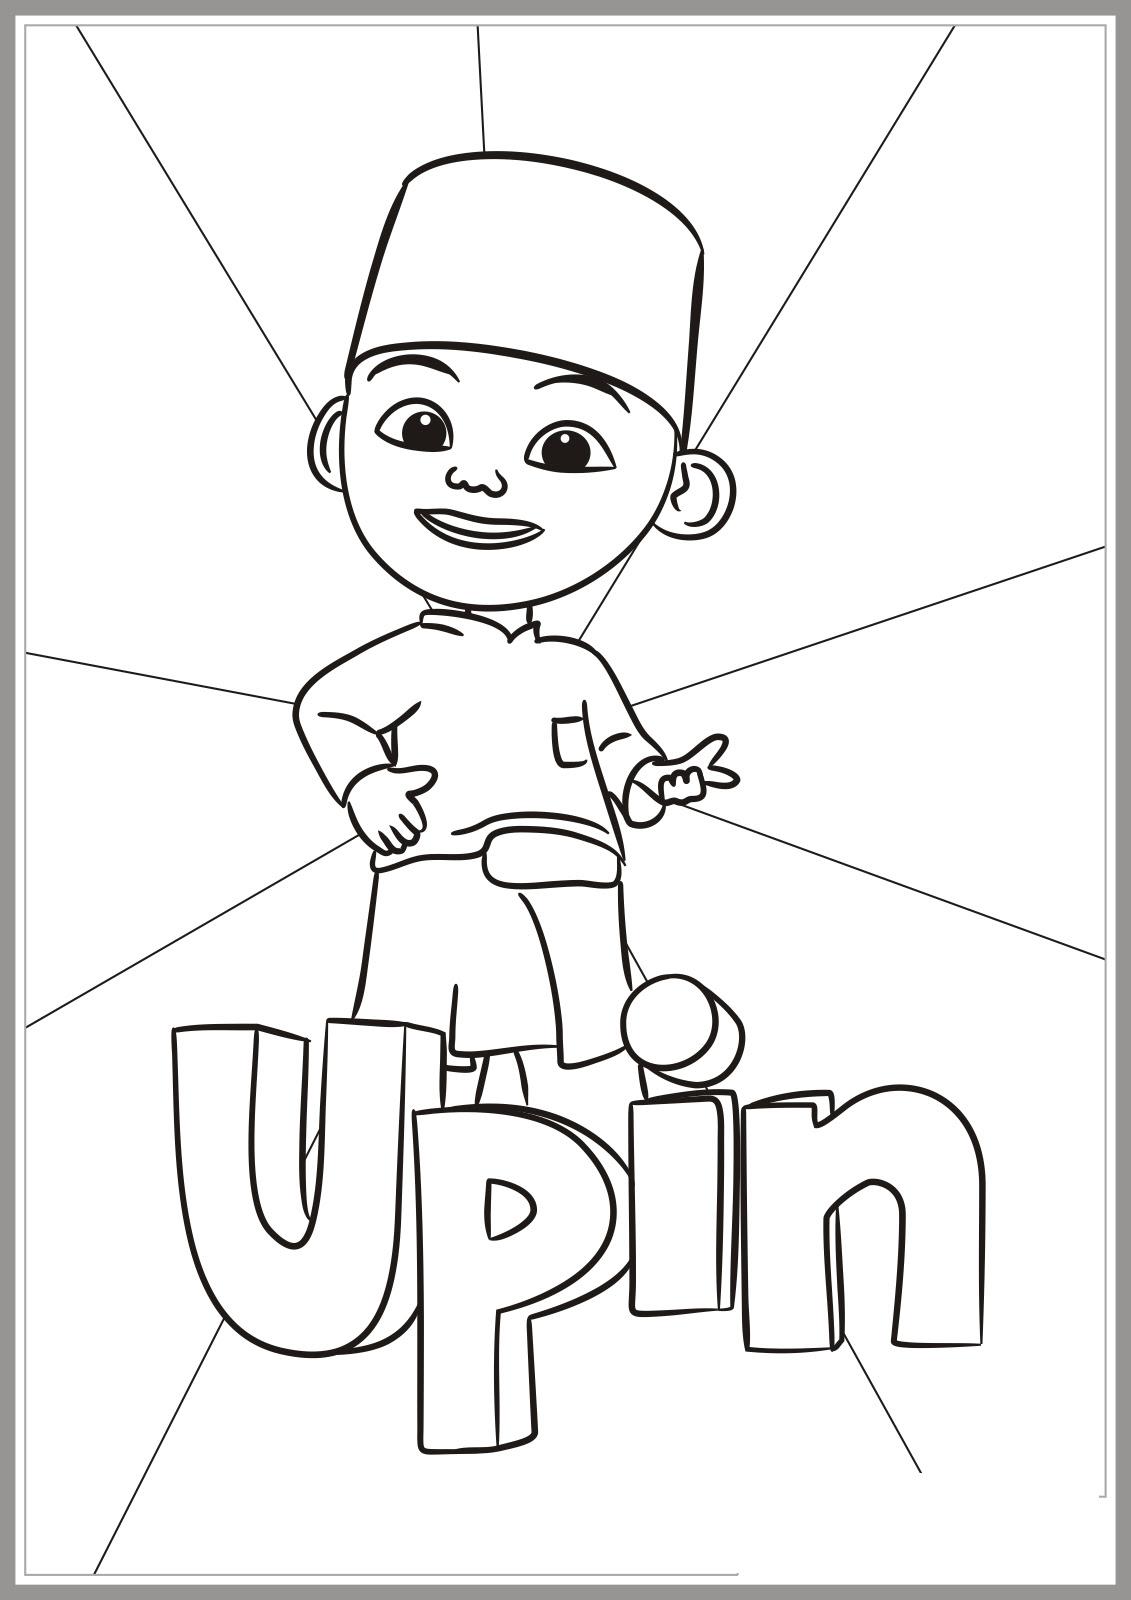 Gambar Mewarnai Upin Ipin Anak Paud Tk Aneka Di Sketch Coloring Page